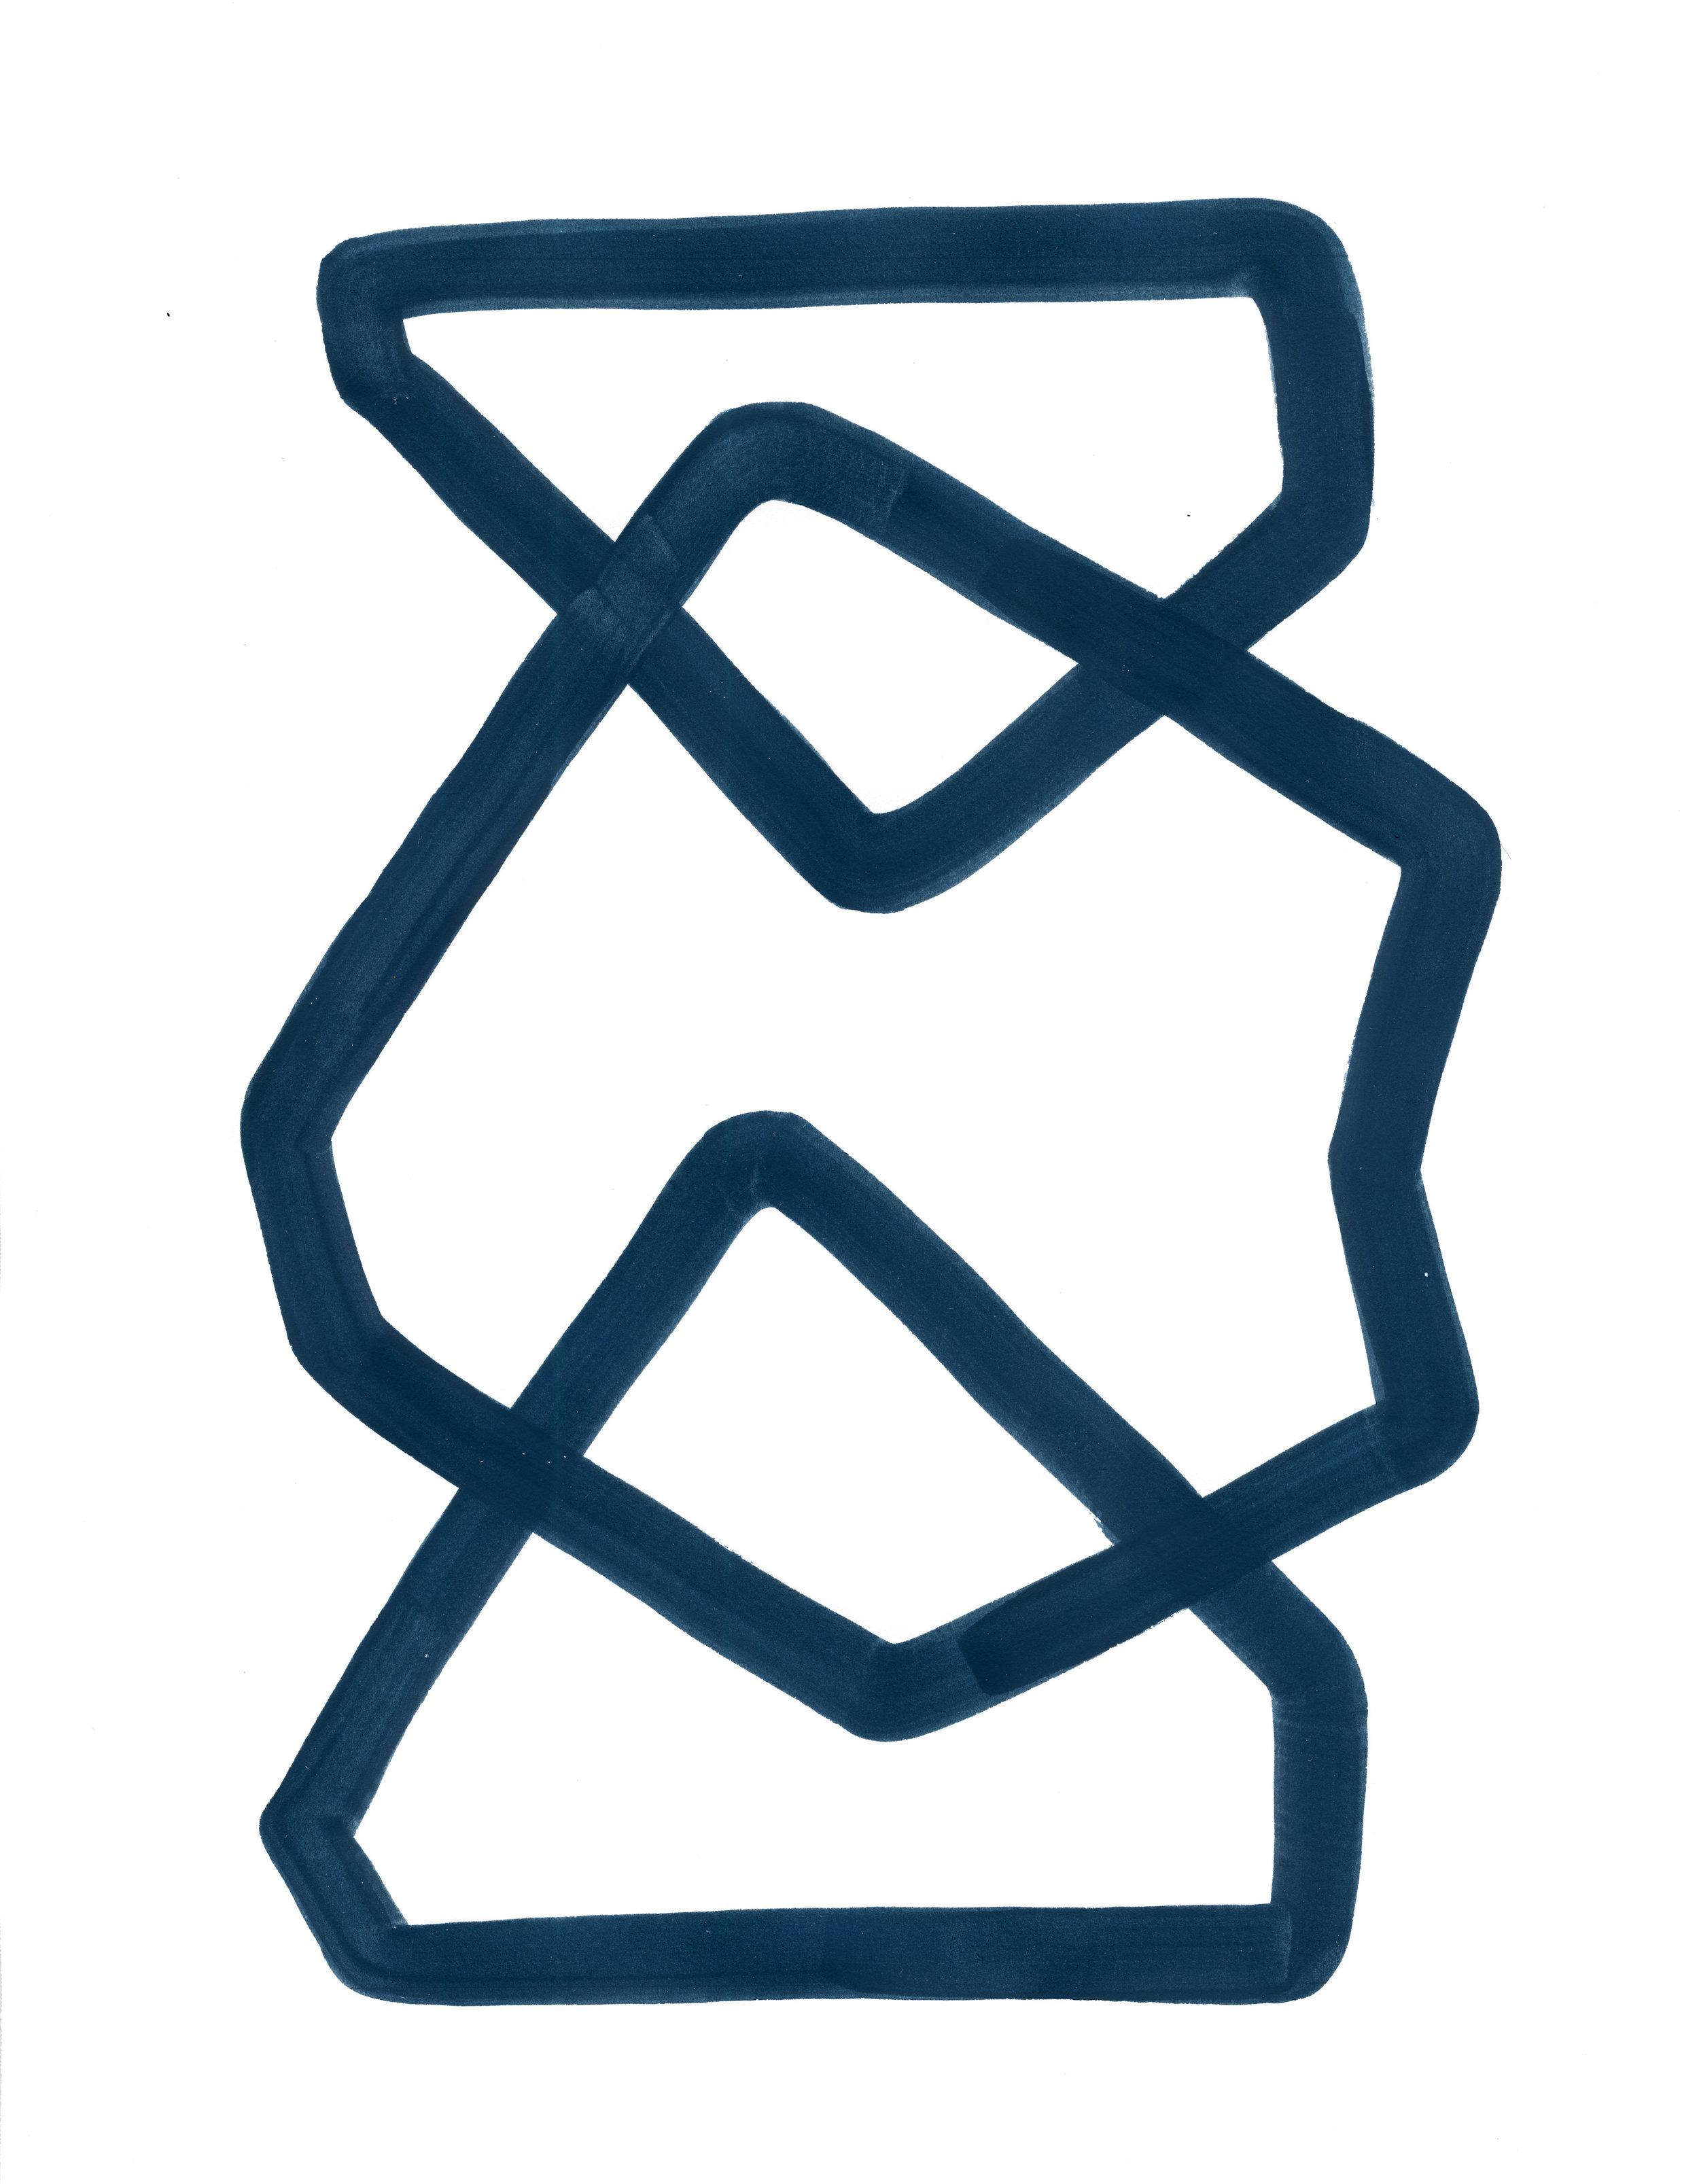 Threes-XVII.jpg